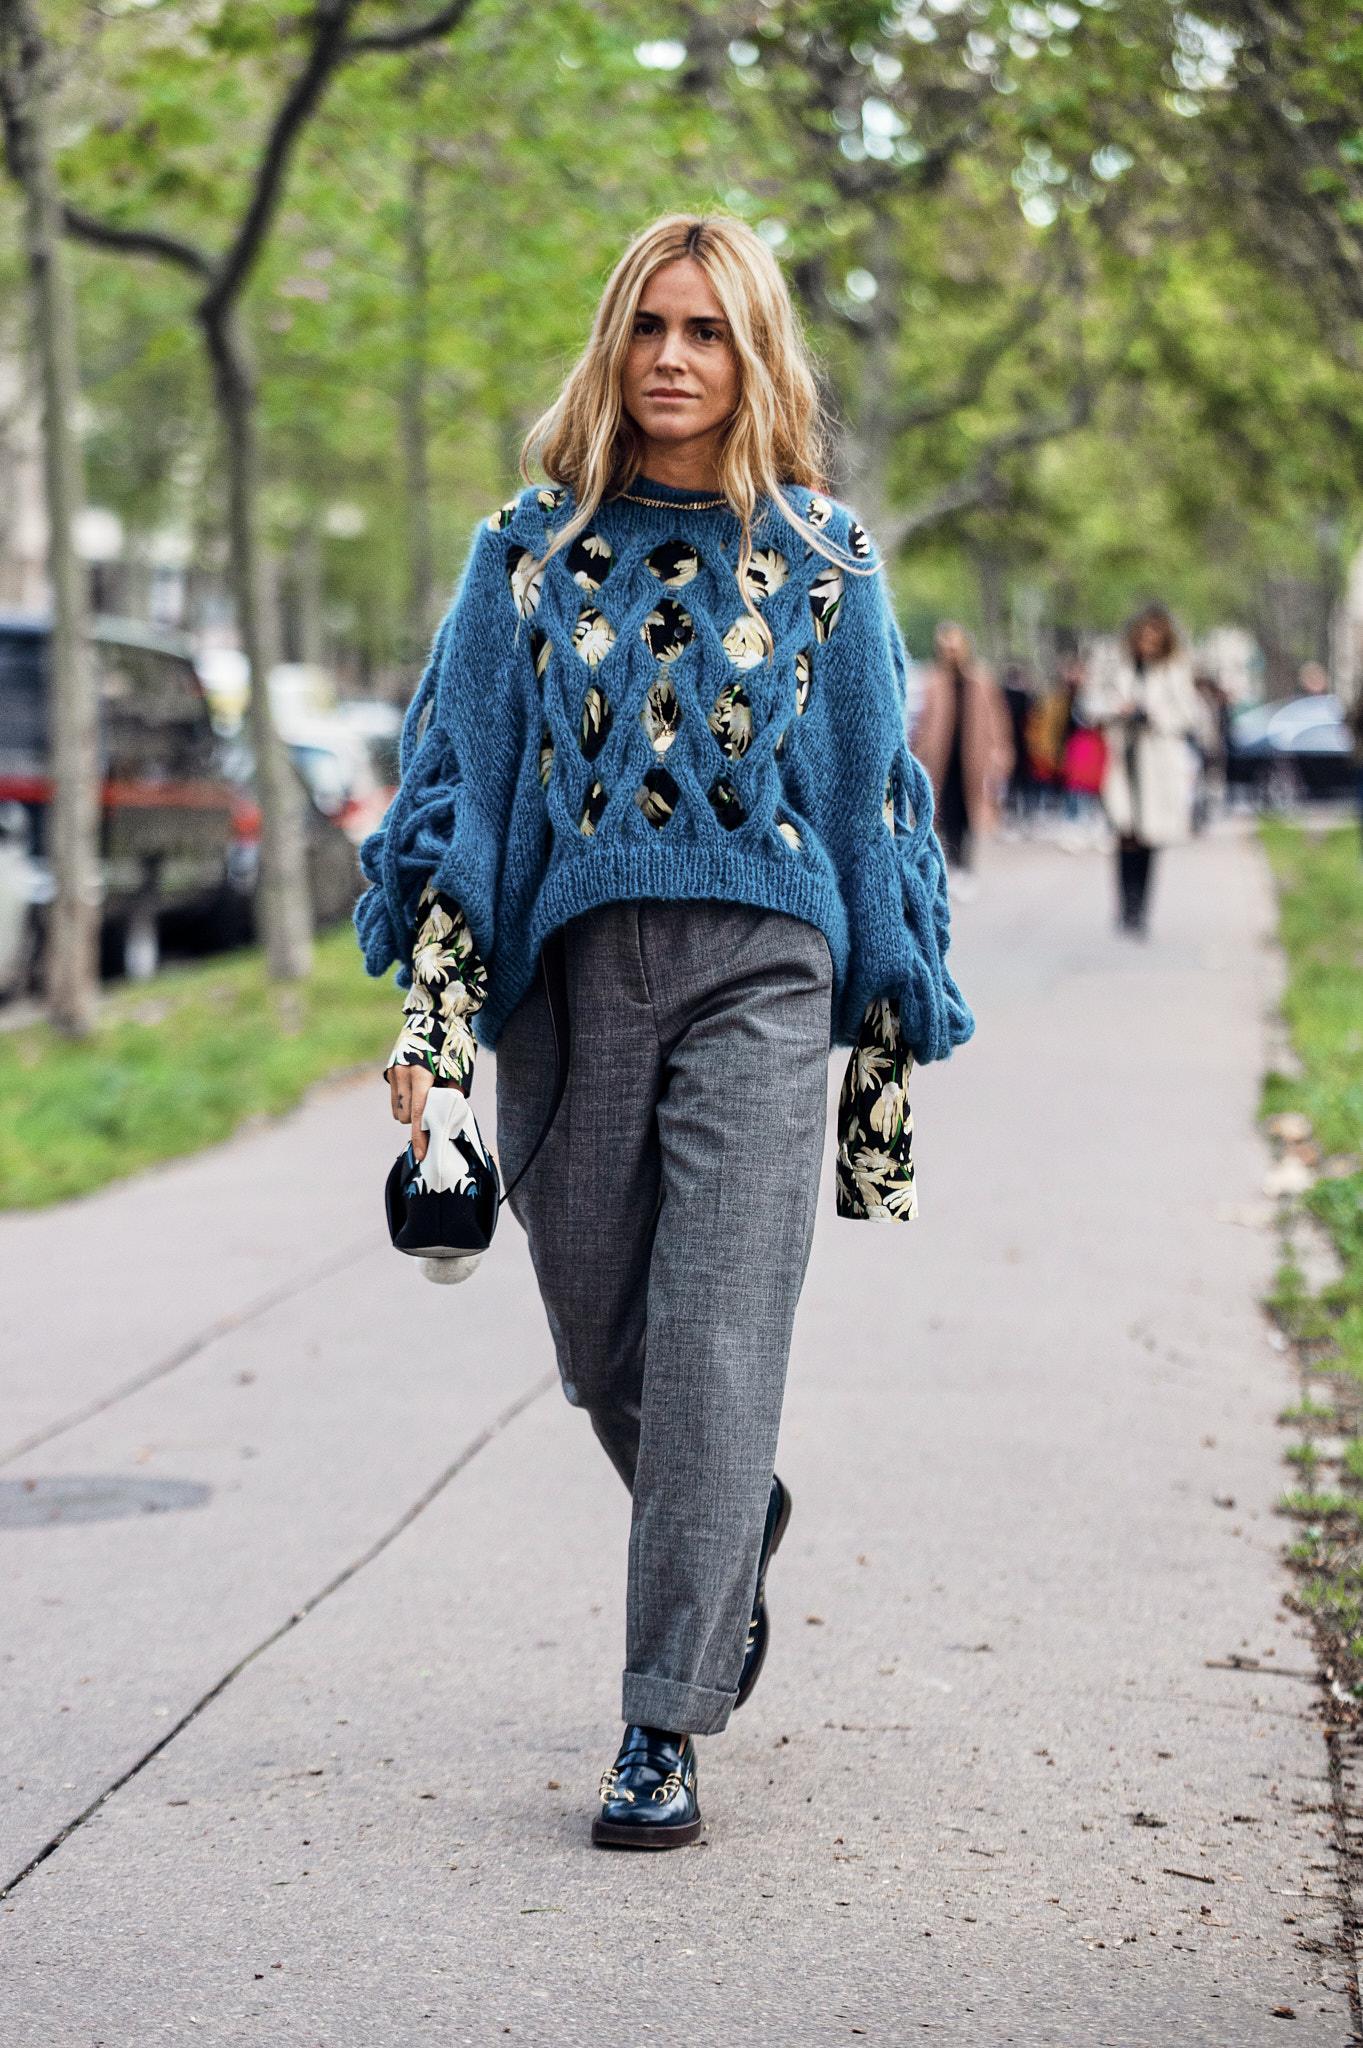 Blanca Miró Scrimieri - Outside Loewe - Paris Fashion Week SS20